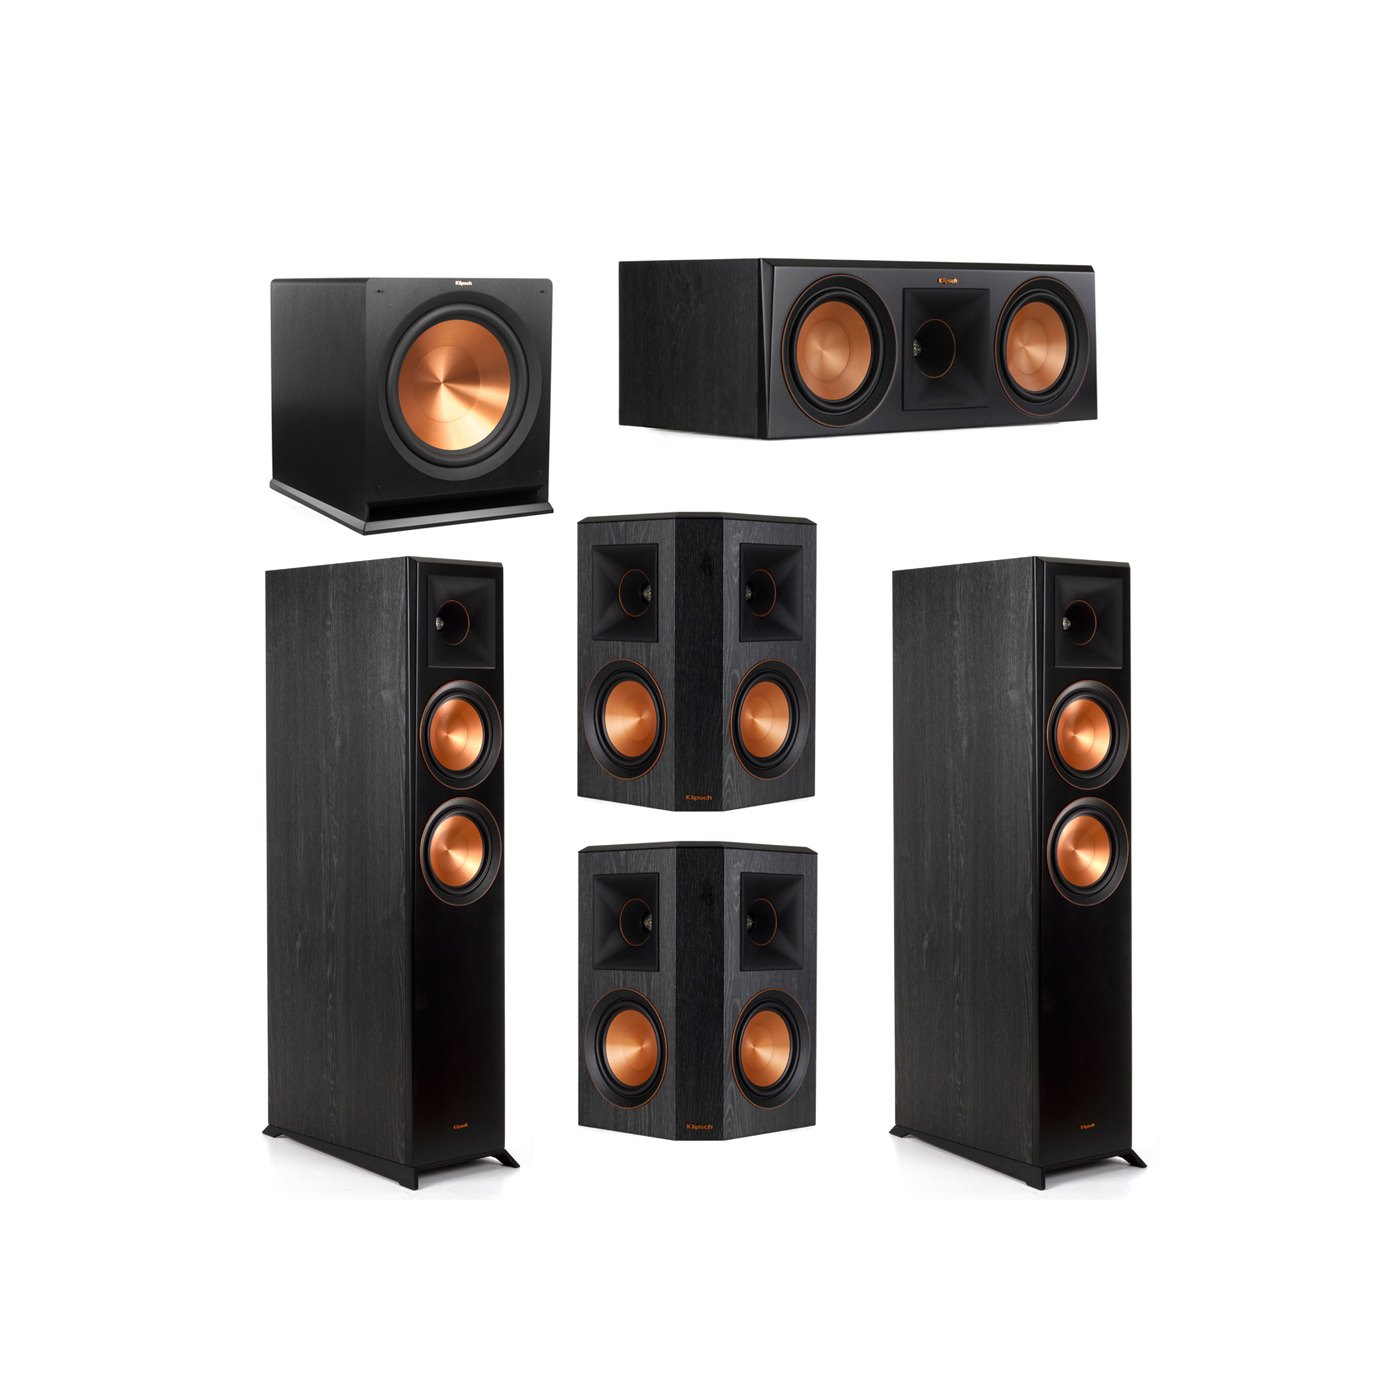 Klipsch 5.1 System with 2 RP-6000F Floorstanding Speakers, 1 Klipsch RP-600C Center Speaker, 2 Klipsch RP-502S Surround Speakers, 1 Klipsch R-115SW Subwoofer